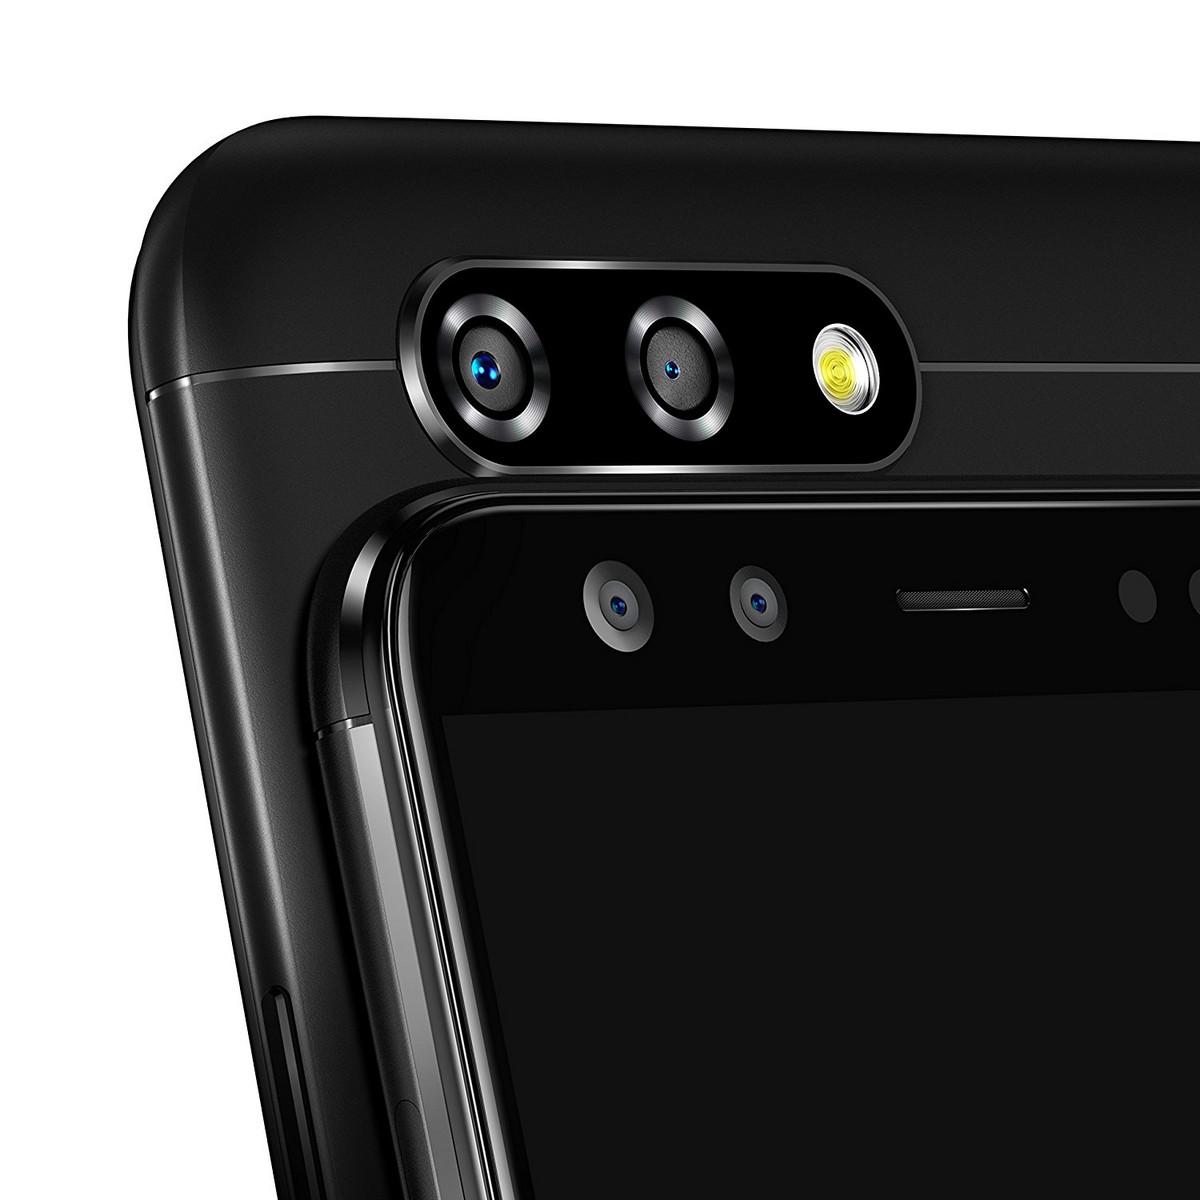 Blu Vivo One And Vivo X Unlocked Android Handsets Coming